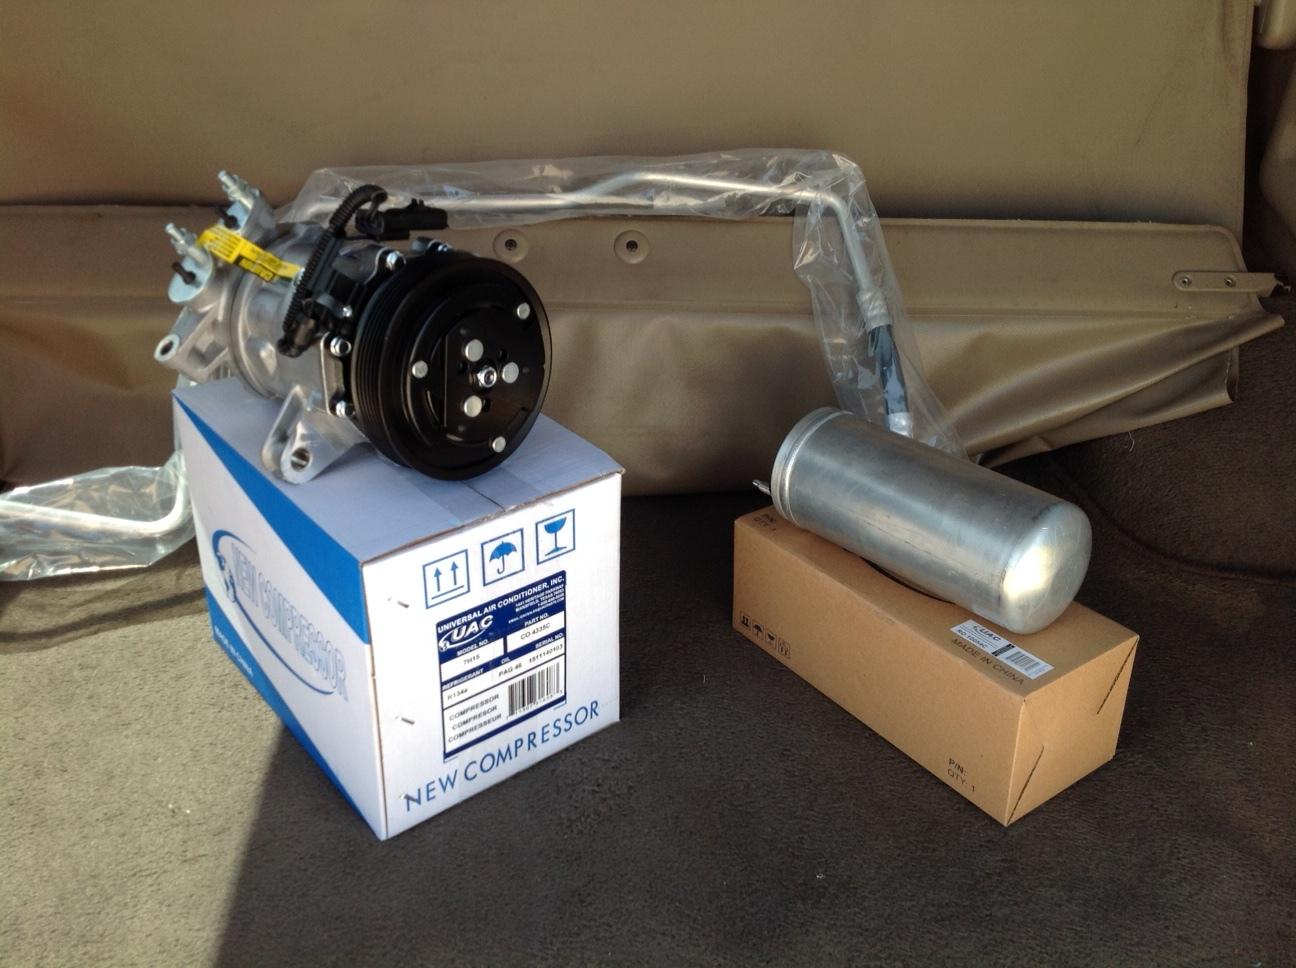 02 05 jeep liberty 3.7 ac air conditioning compressor repair kit  3